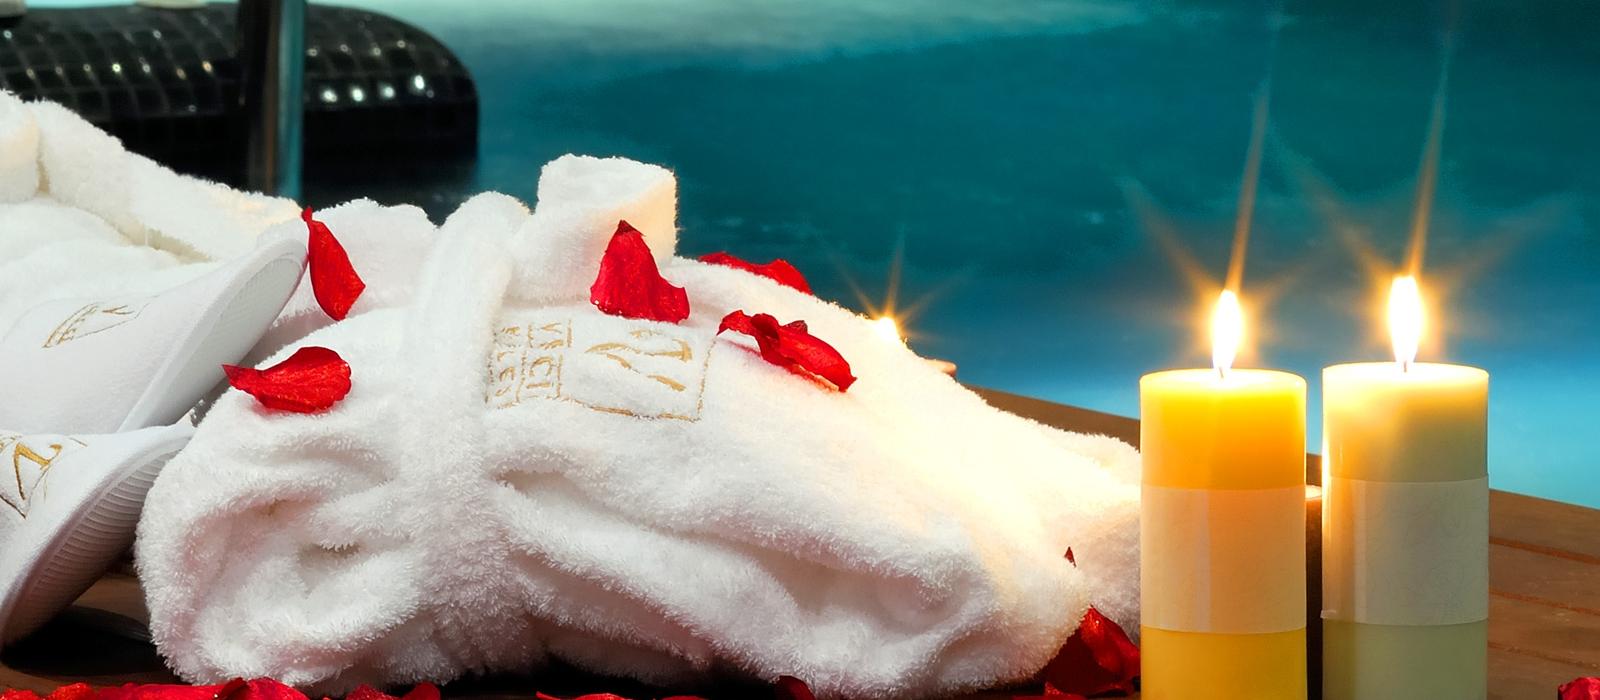 Servizi Hotel Tenerife Golf - Vincci Hoteles - Spa